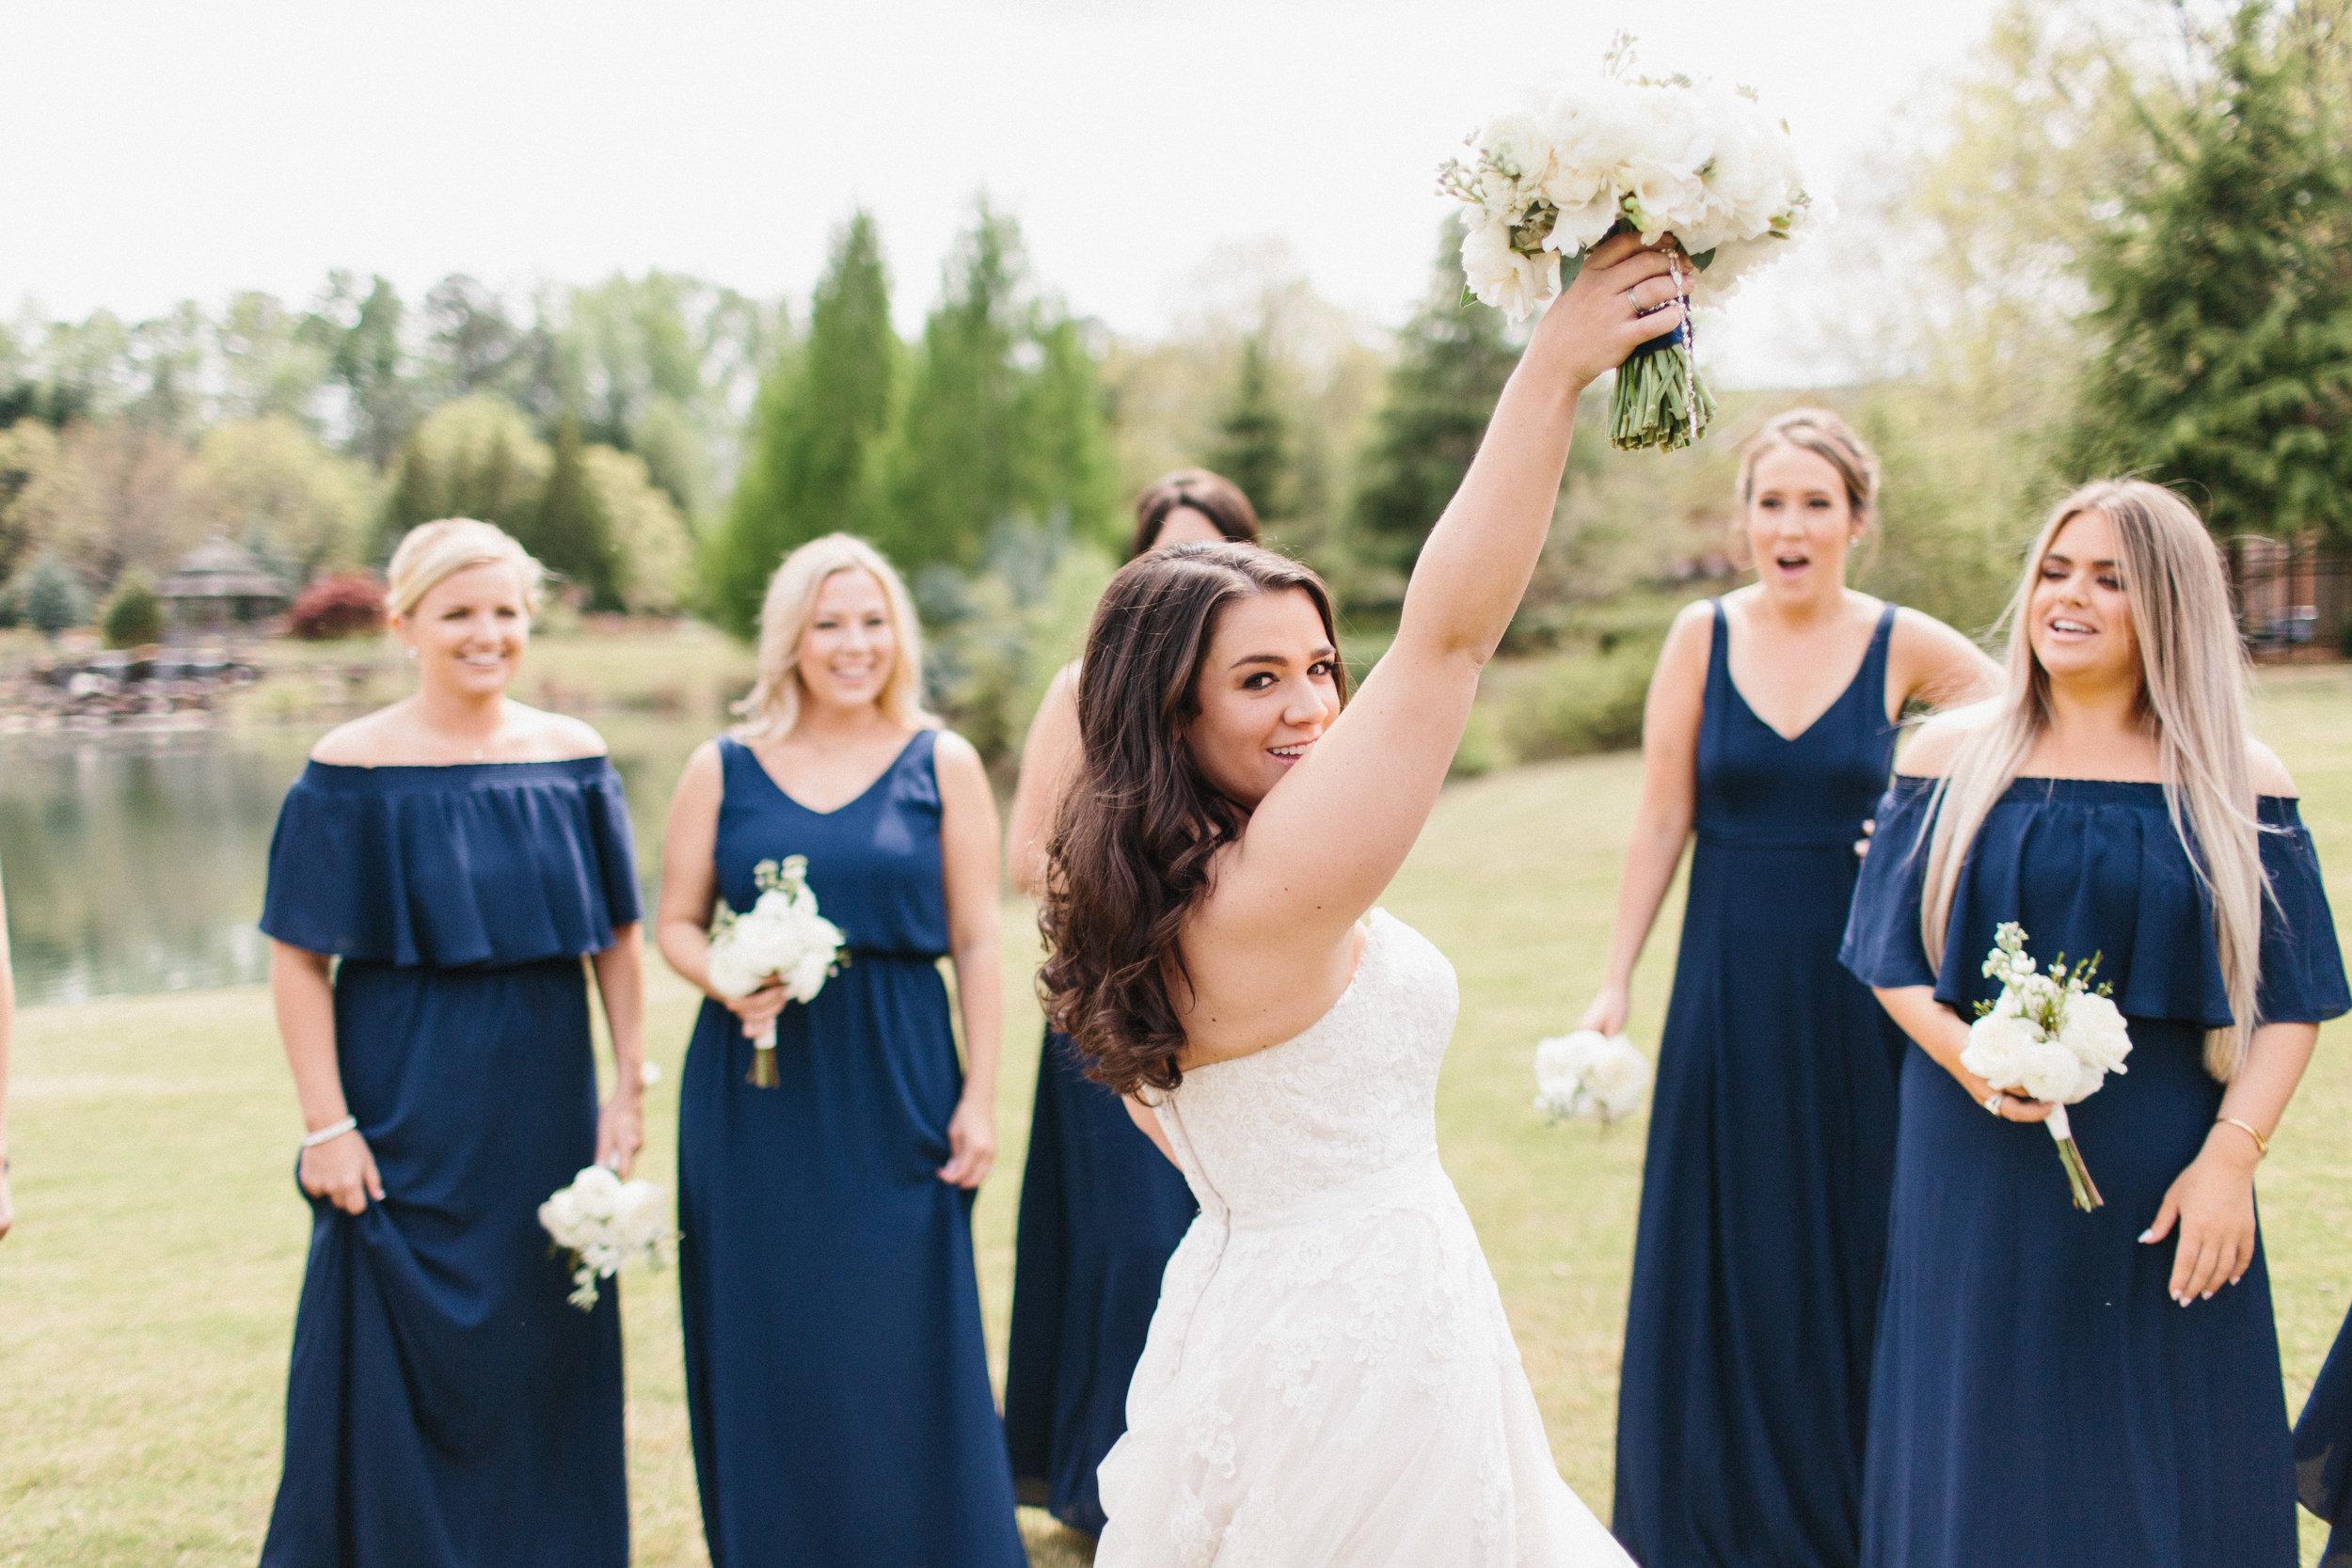 roswell_st_peter_chanel_catholic_avalon_hotel_alpharetta_wedding-1693.jpg